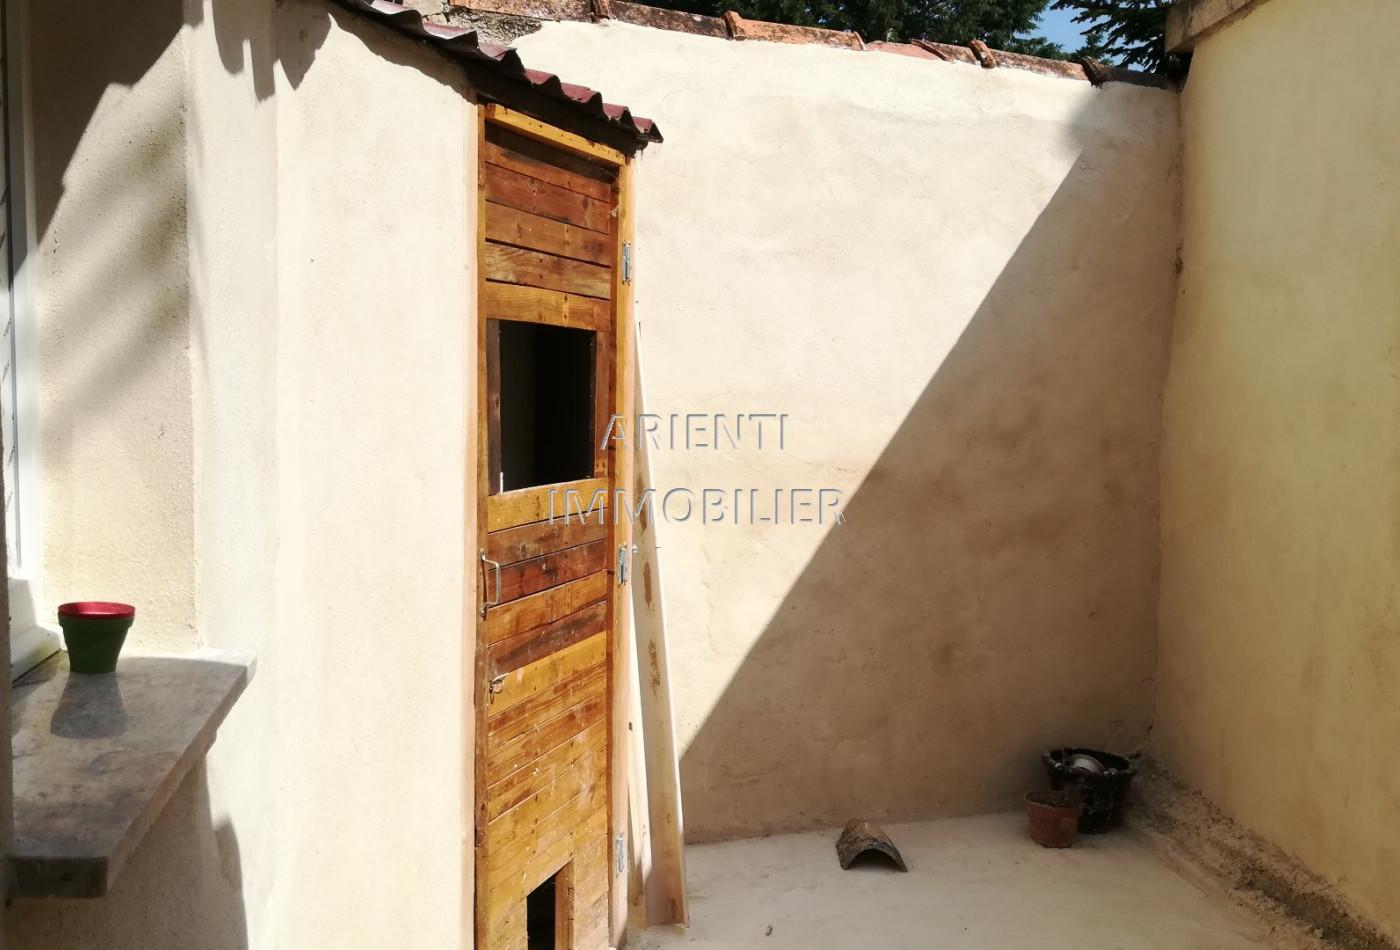 A vendre  Valreas | Réf 260013158 - Office immobilier arienti